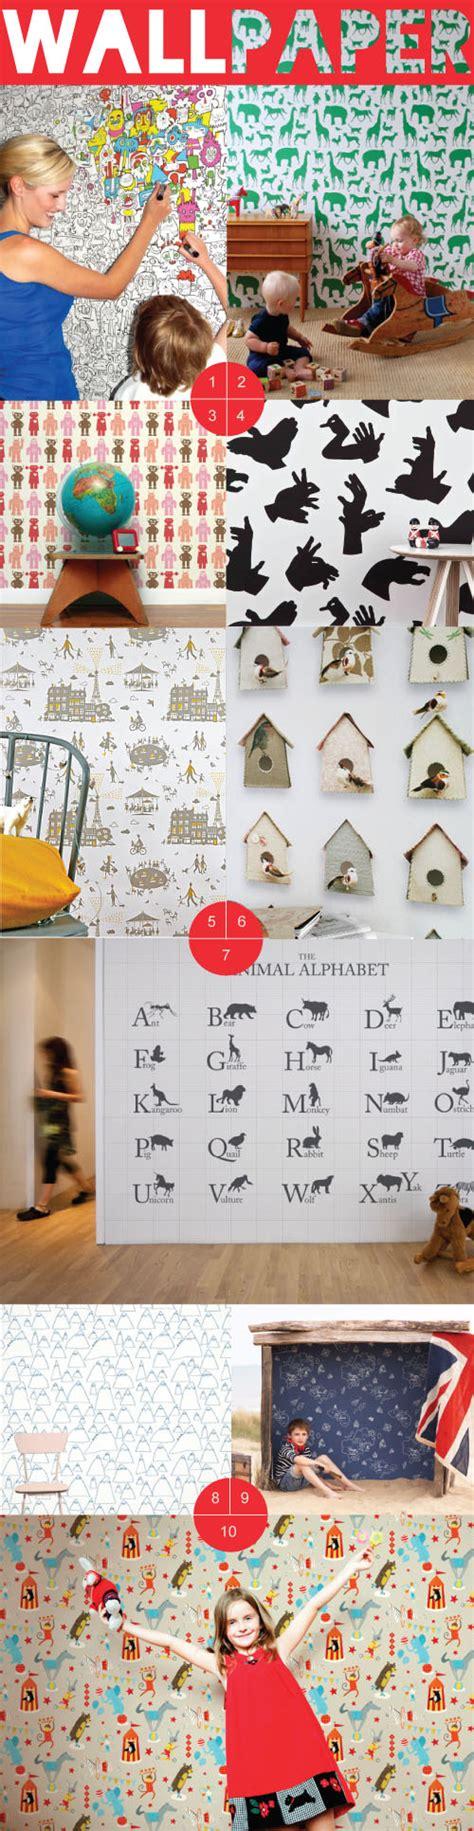 Ferm Living Animal Farm Wallpaper - wonderful wallpaper for rooms part 1 kidstylefile